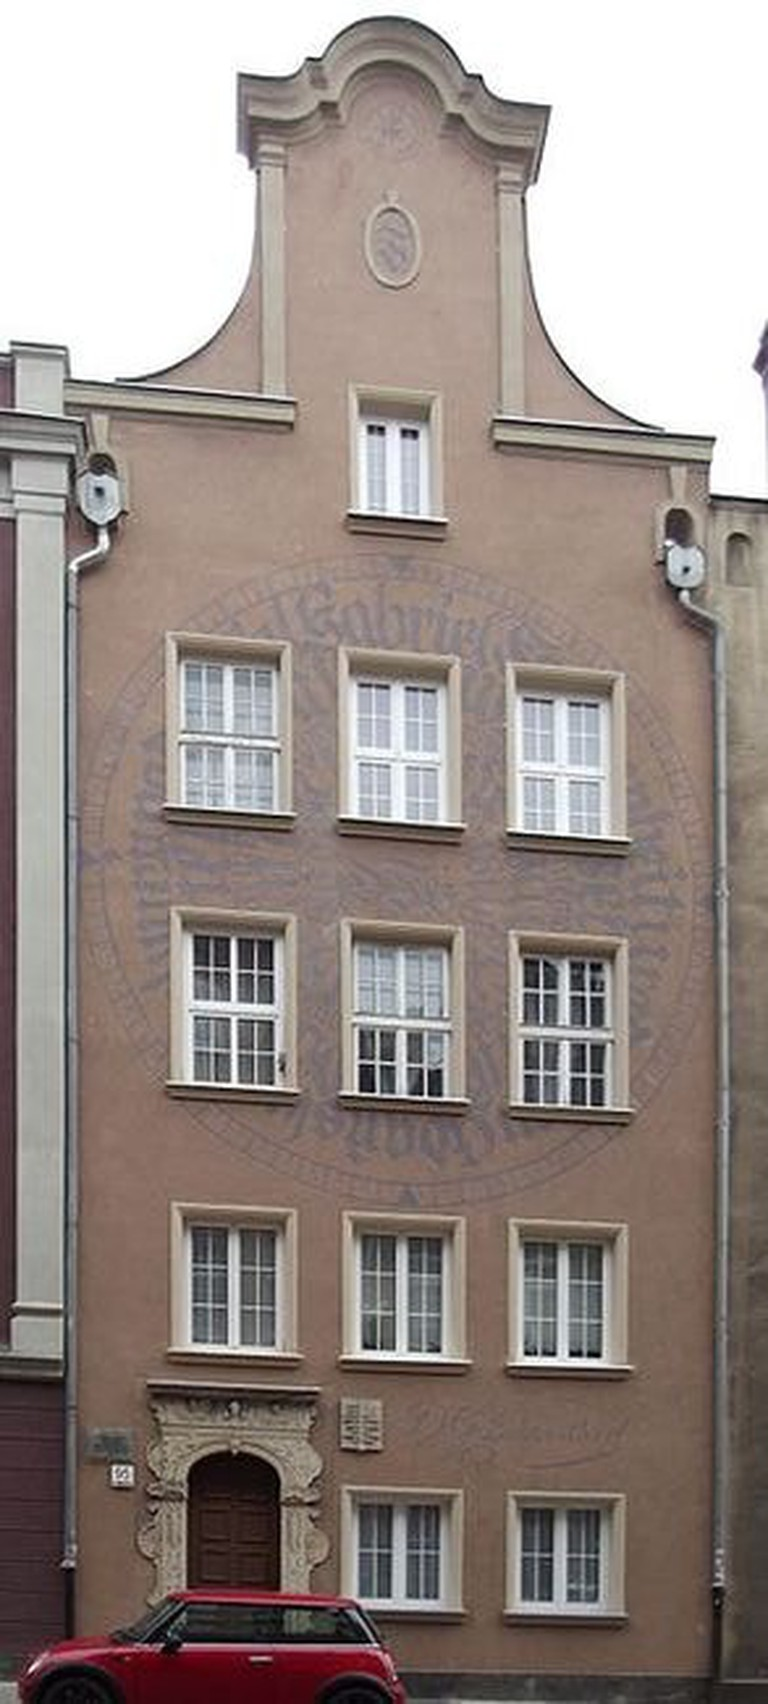 Gdańsk_-_Kamienica_Fahrenheita